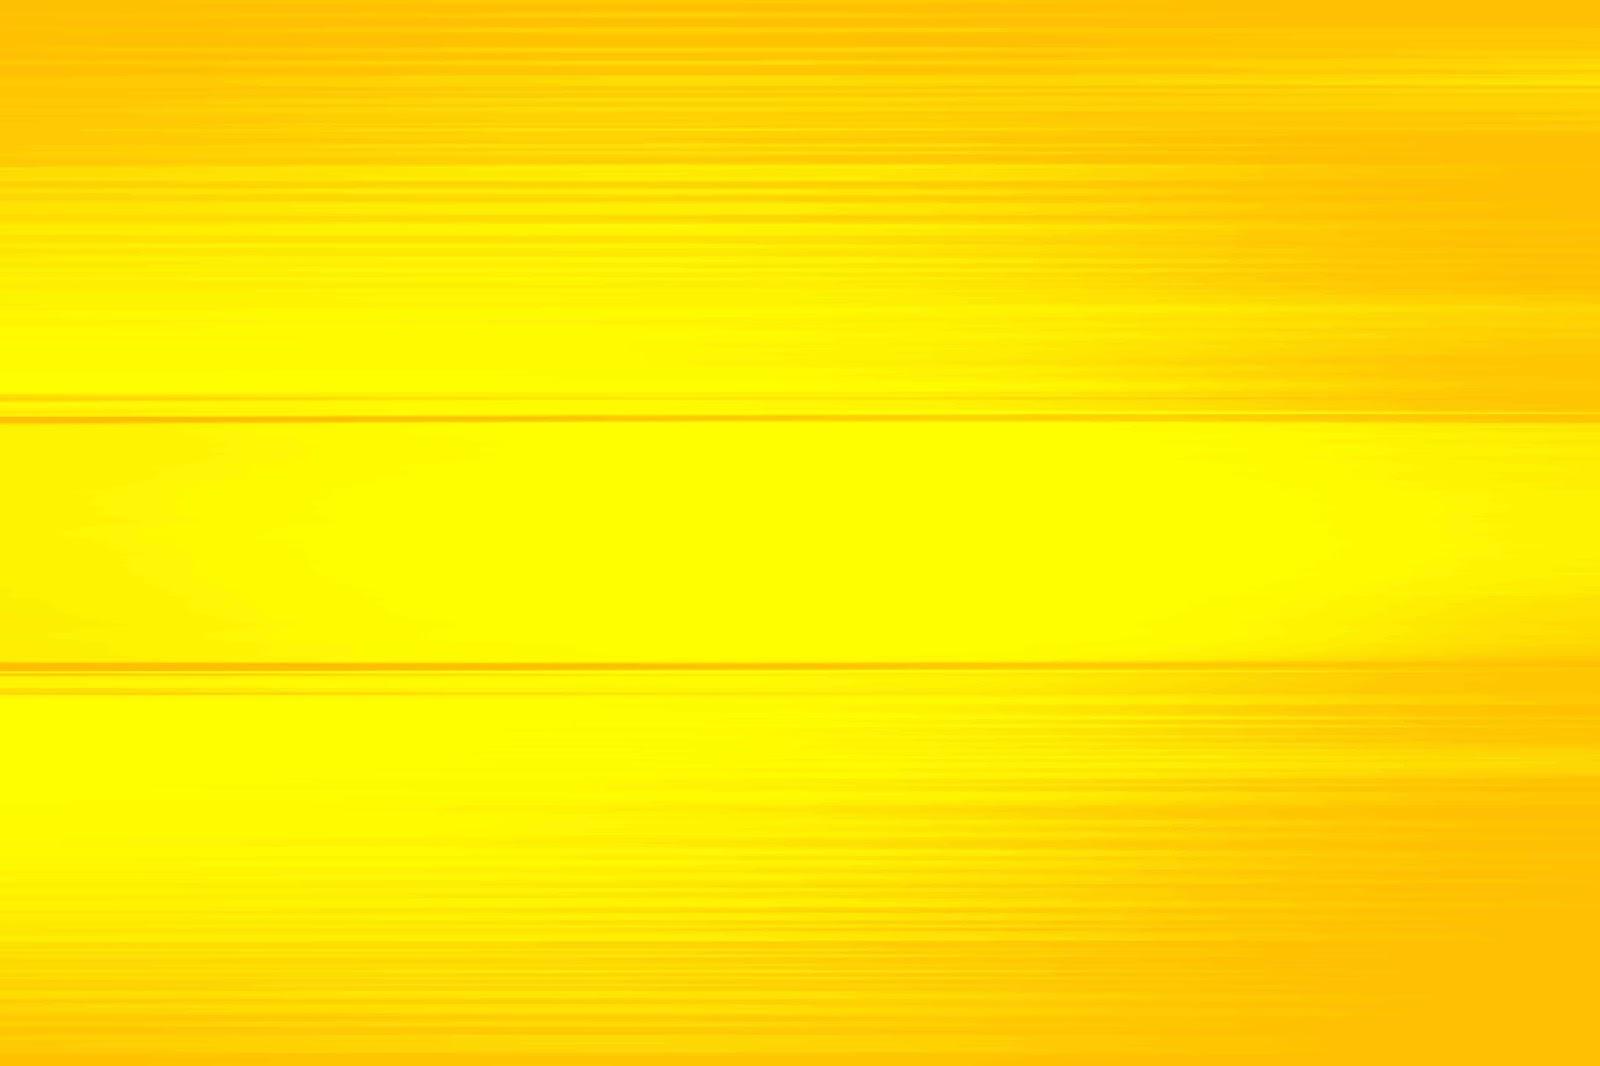 Abstract Yellow Texture HD Wallpaper